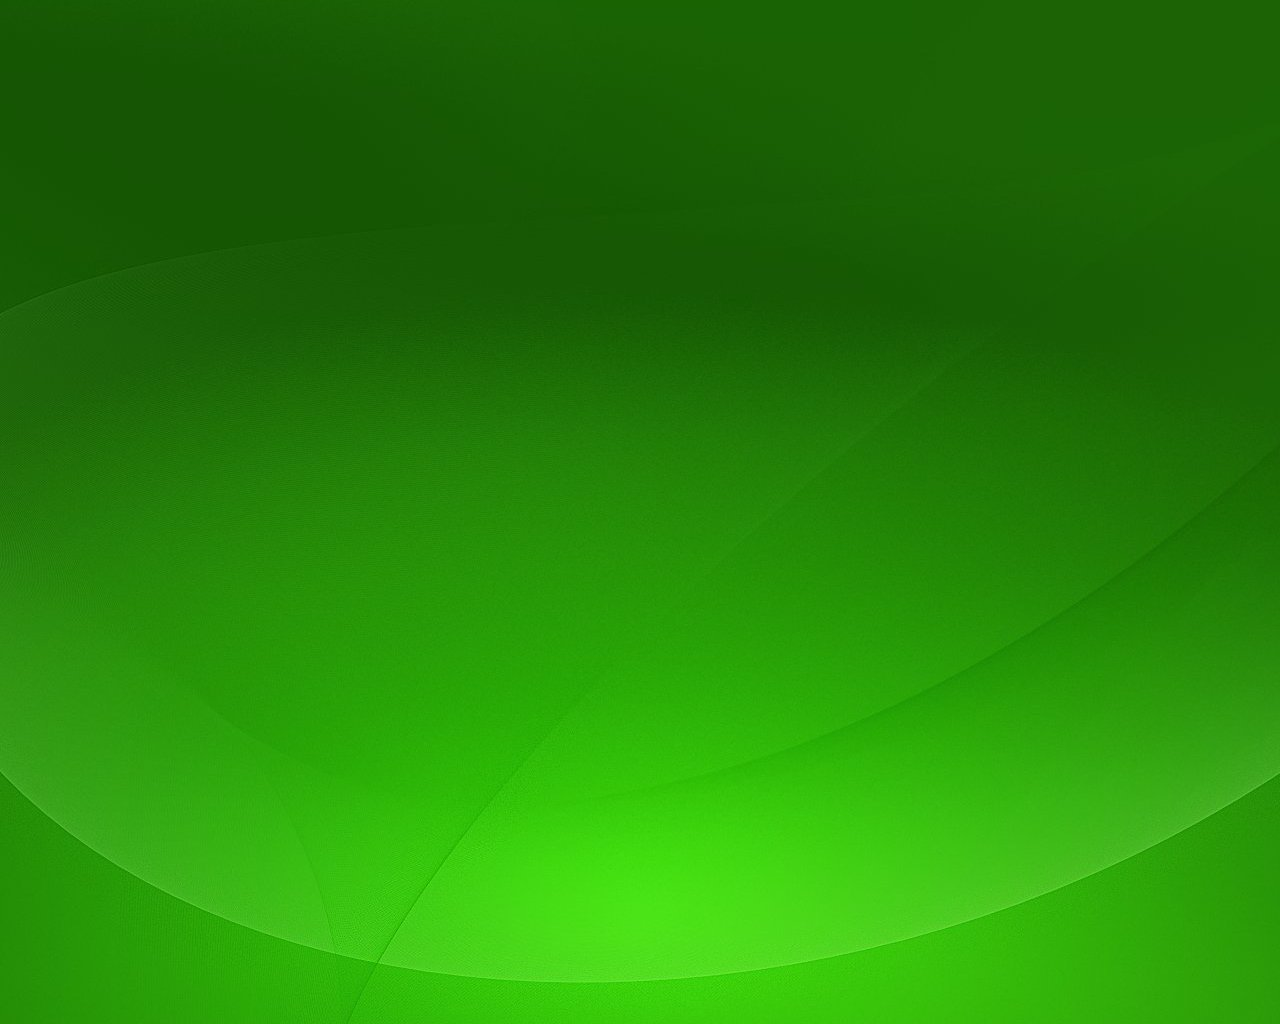 Green Simple Green